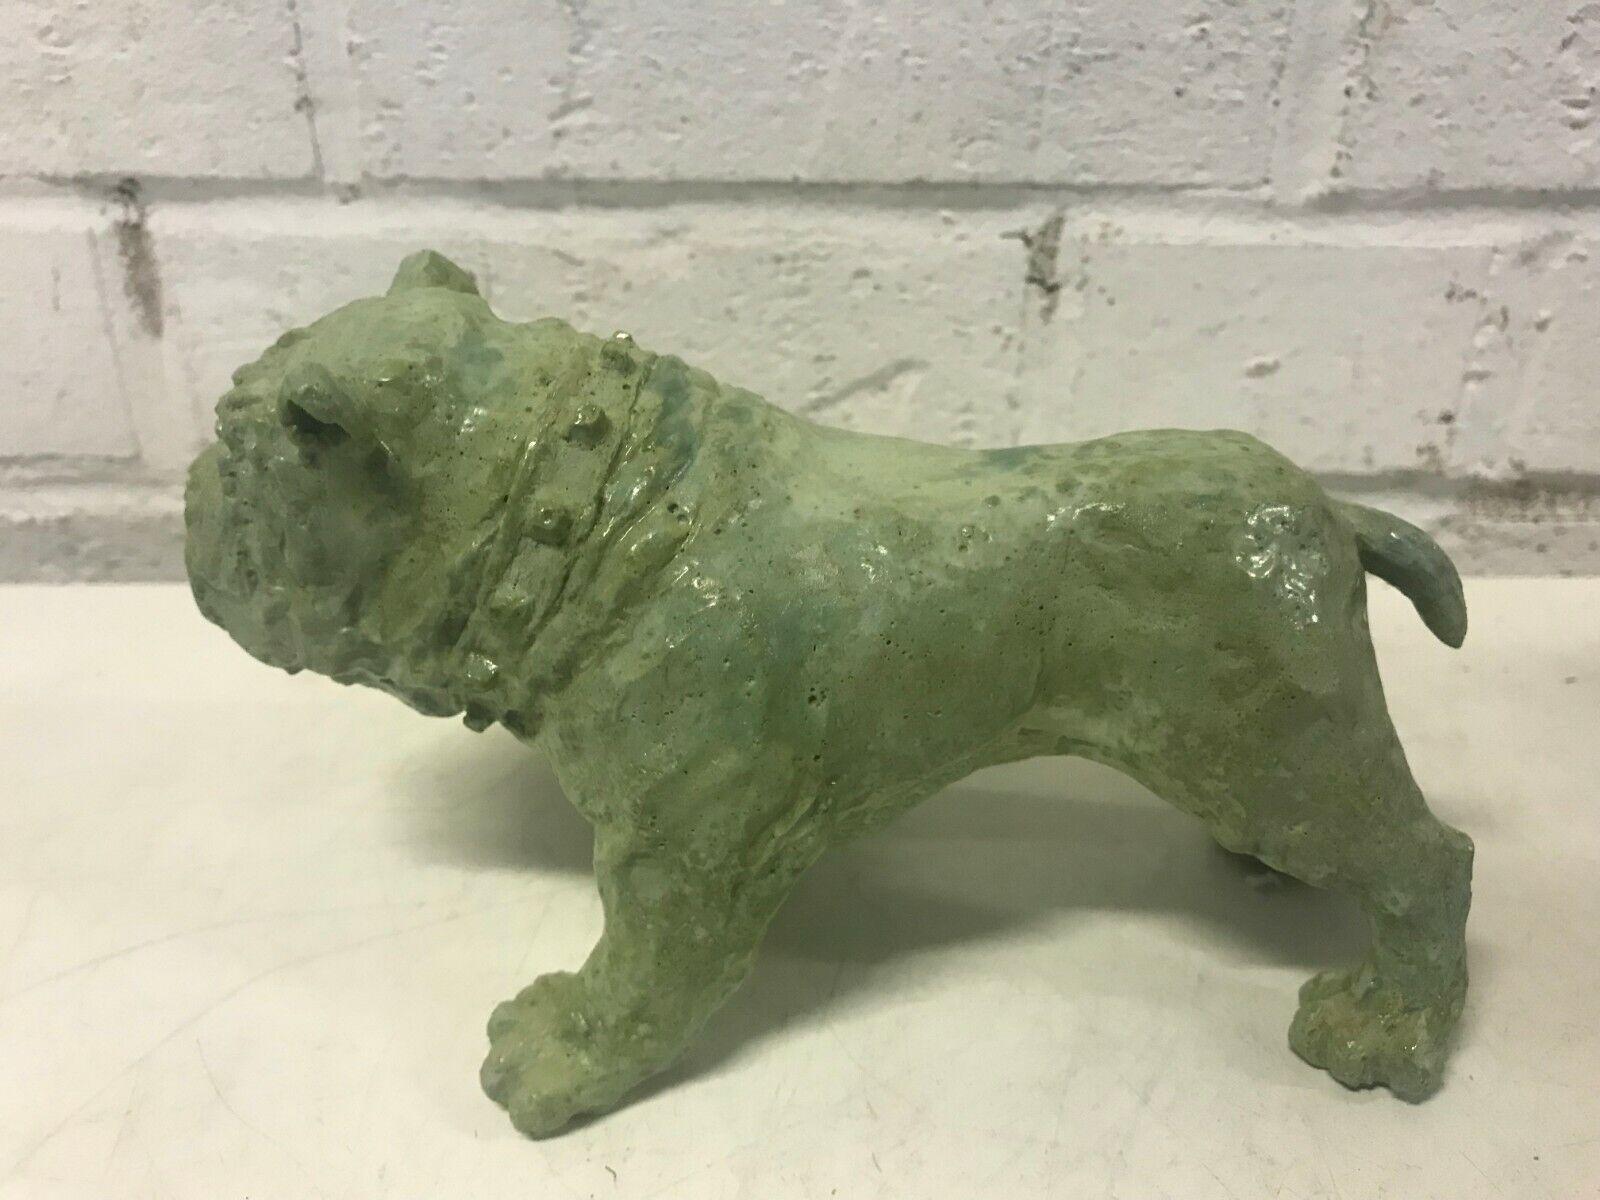 Bulldog anglais figurine vert lustré debout